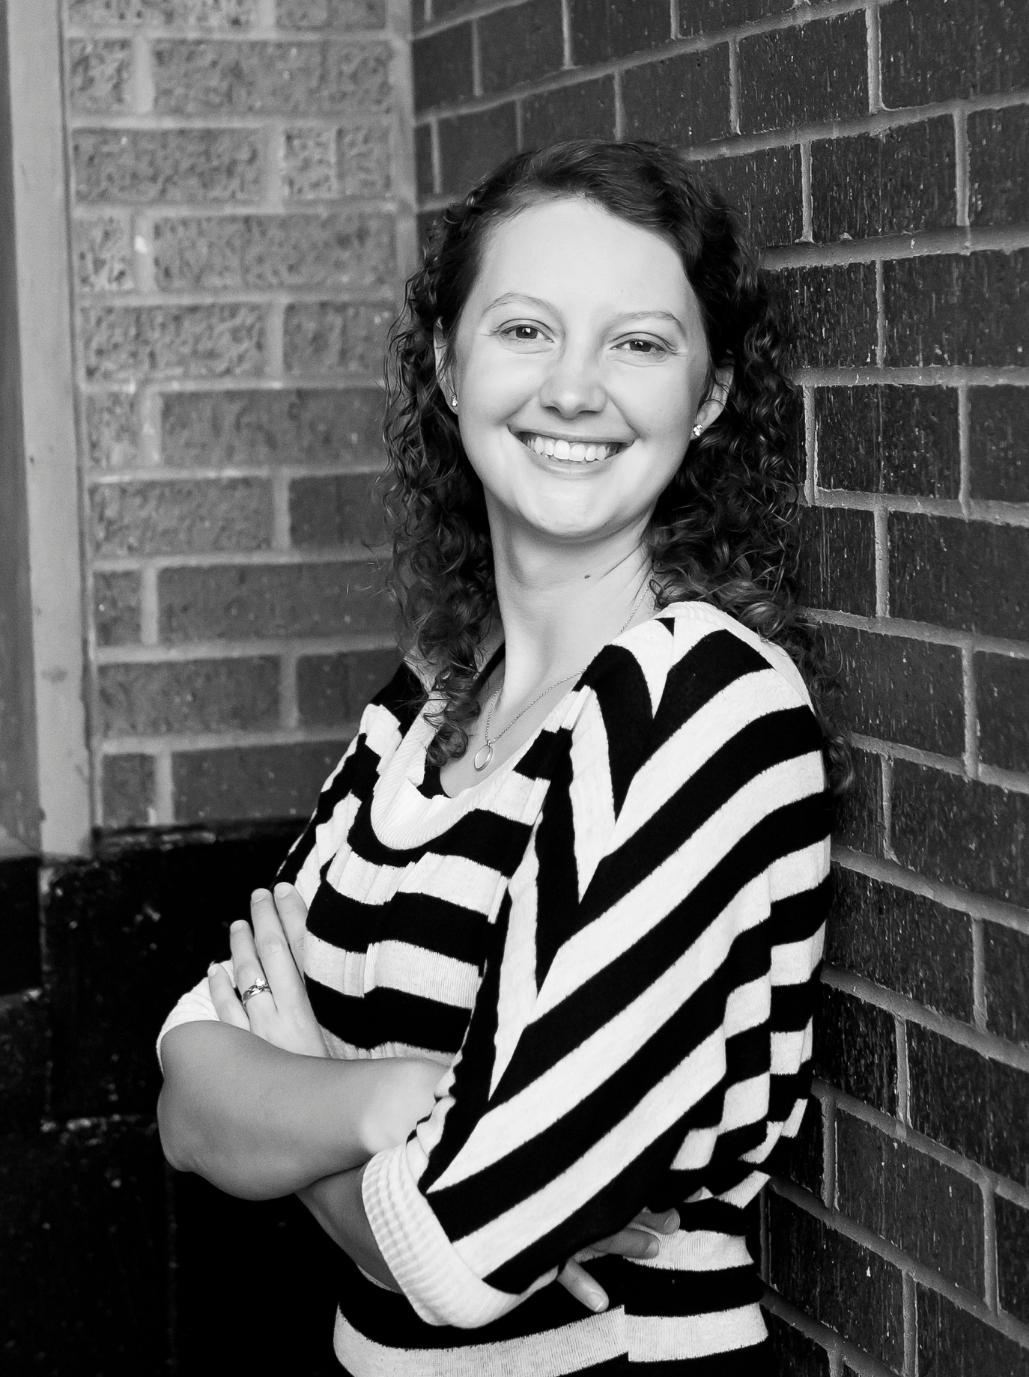 Katelyn Larson